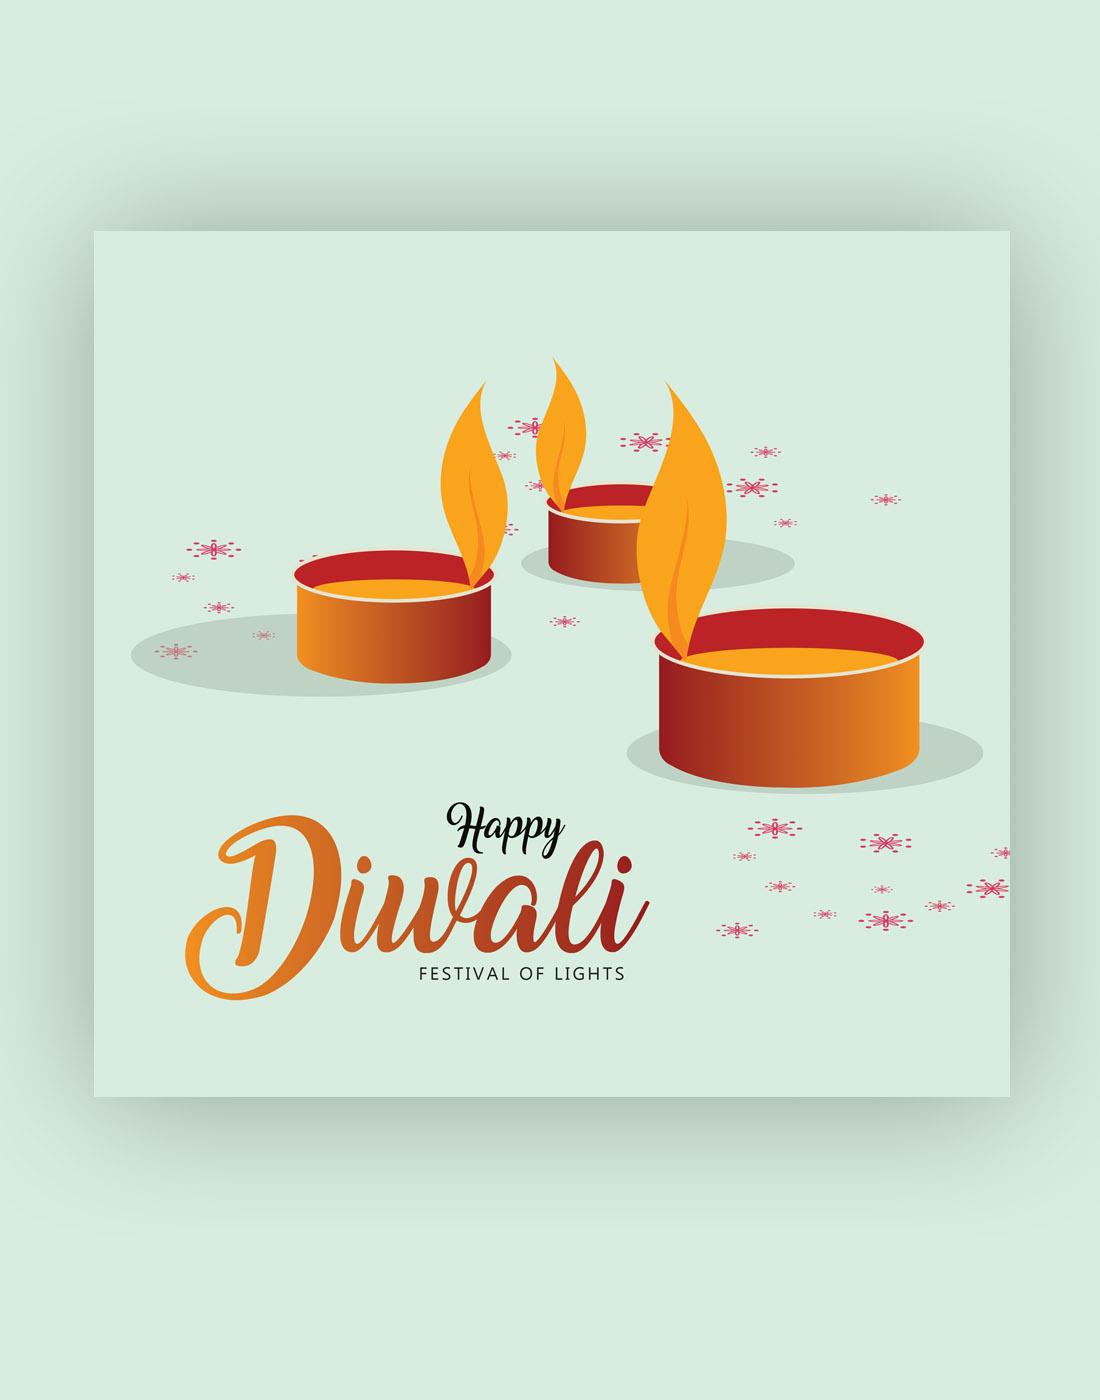 diwali free vector